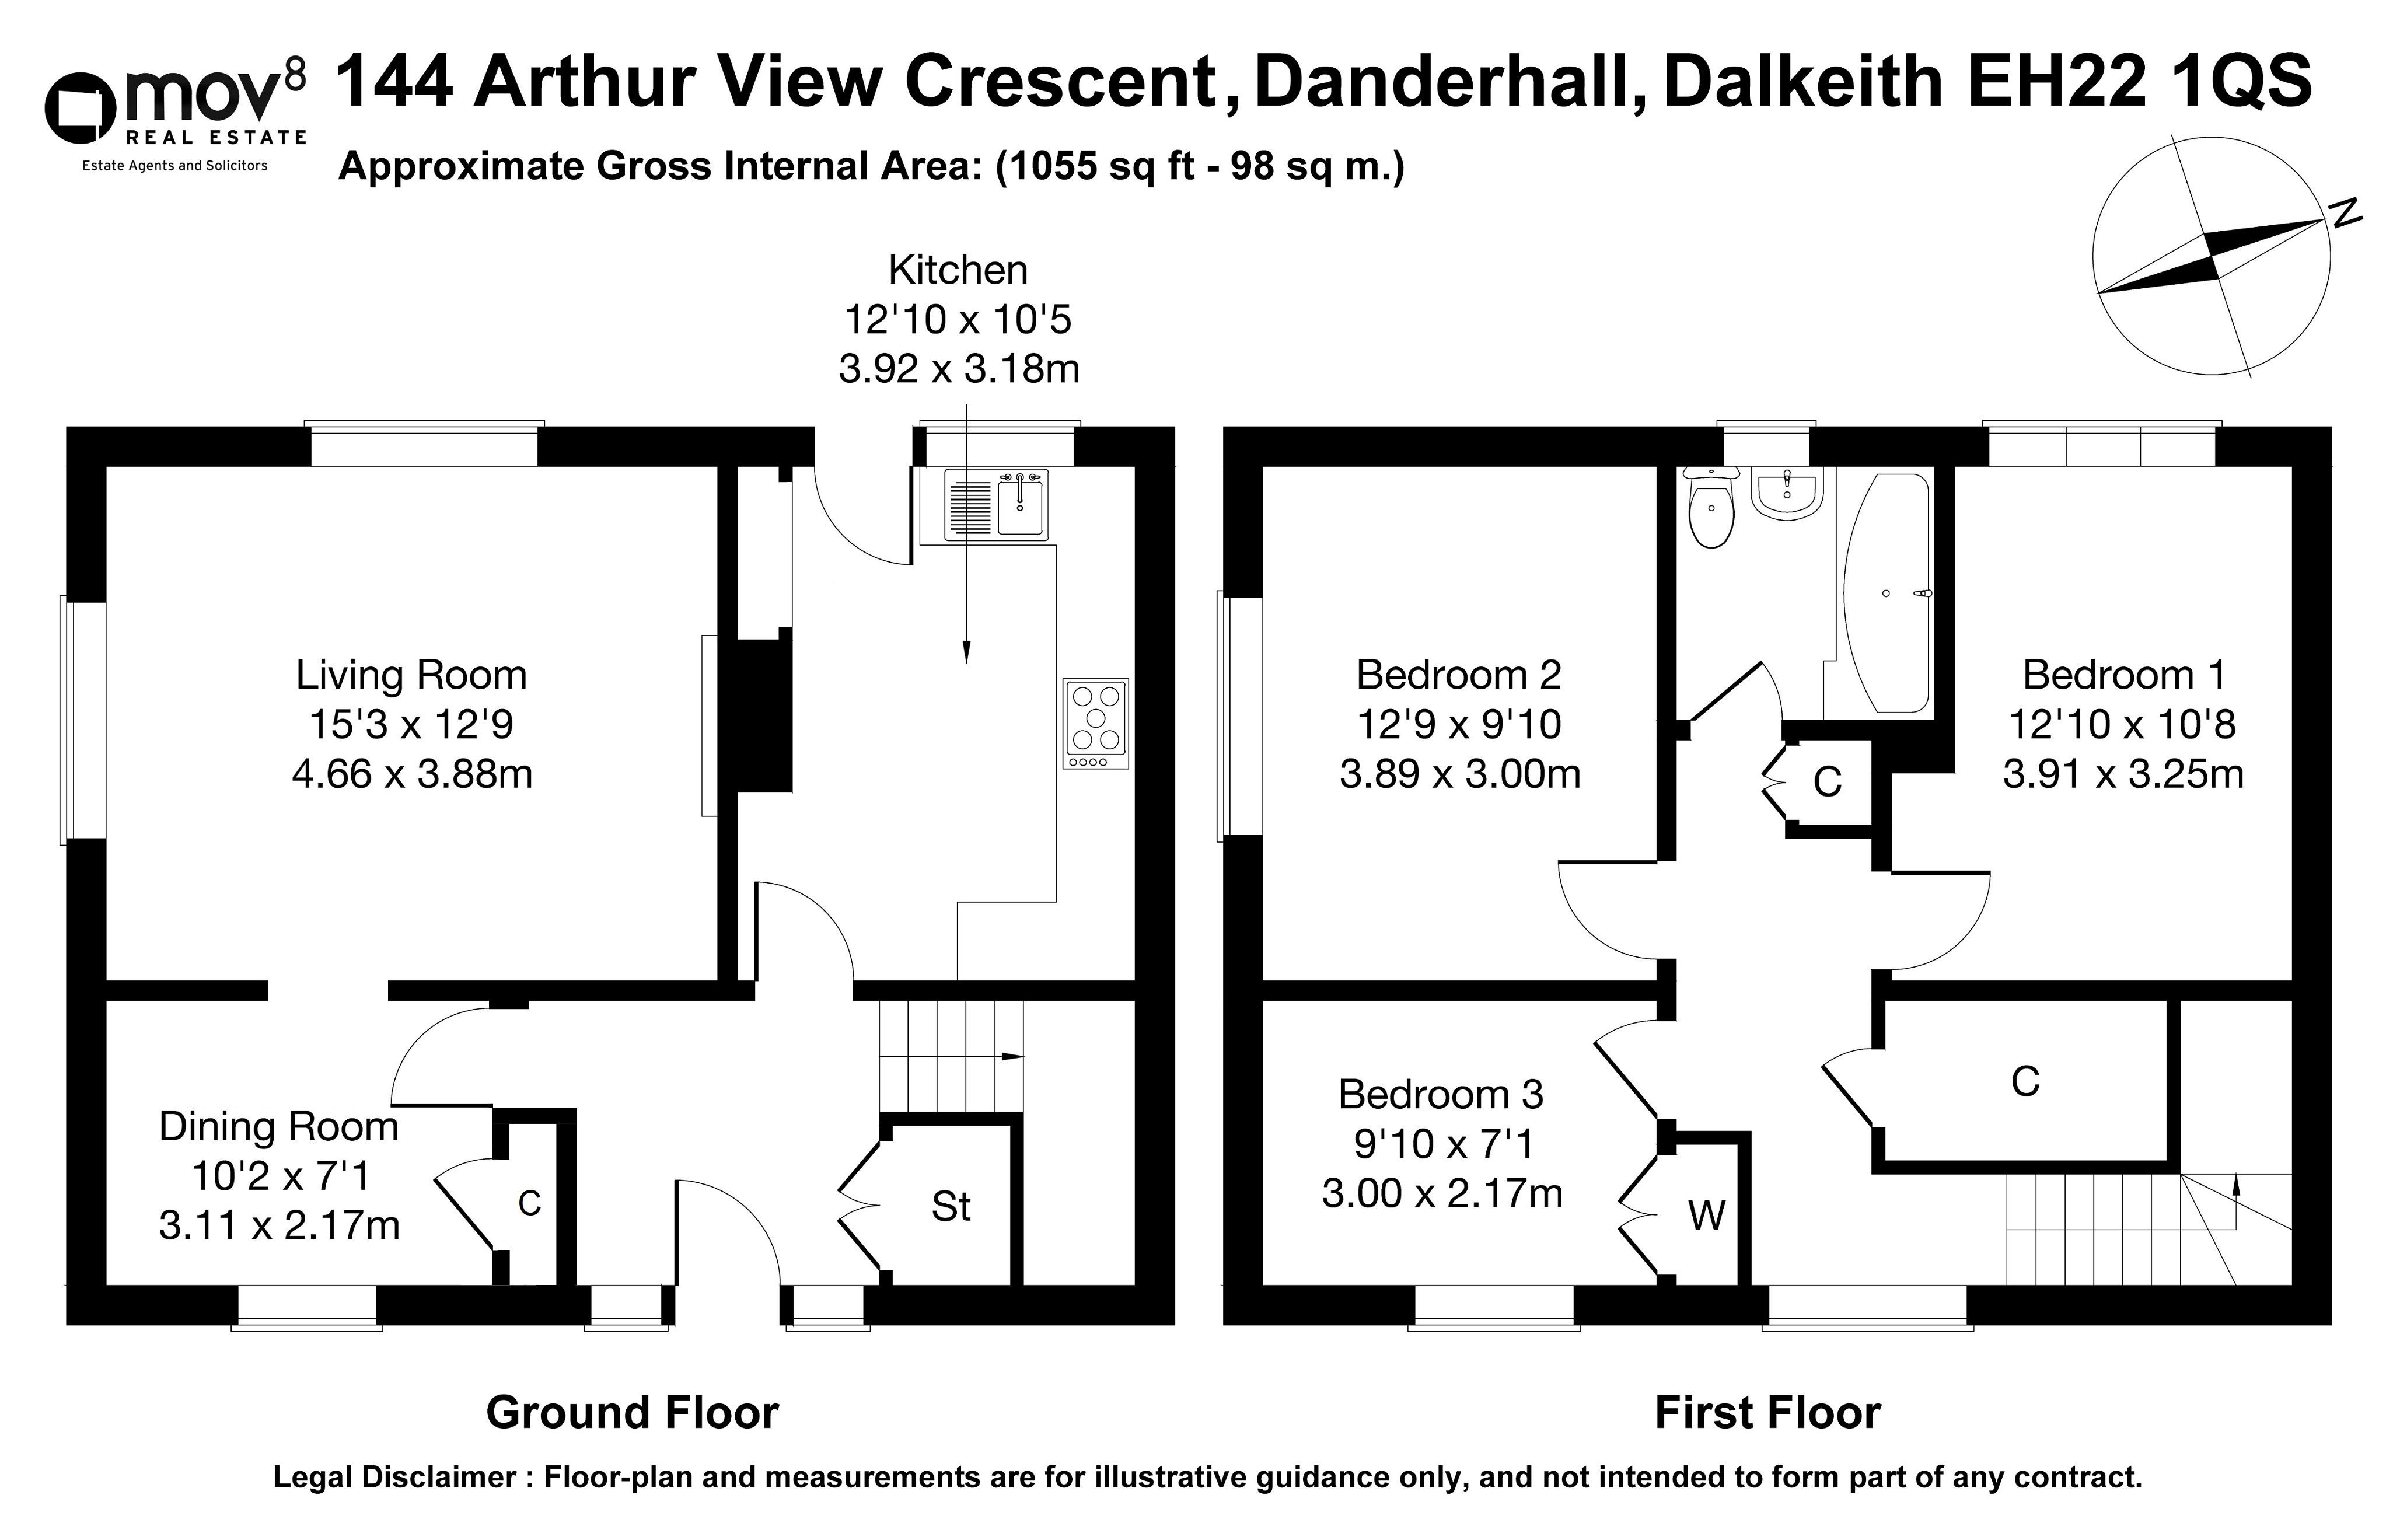 Floorplan 1 of 144 Arthur View Crescent, Danderhall, Dalkeith, Midlothian, EH22 1QS